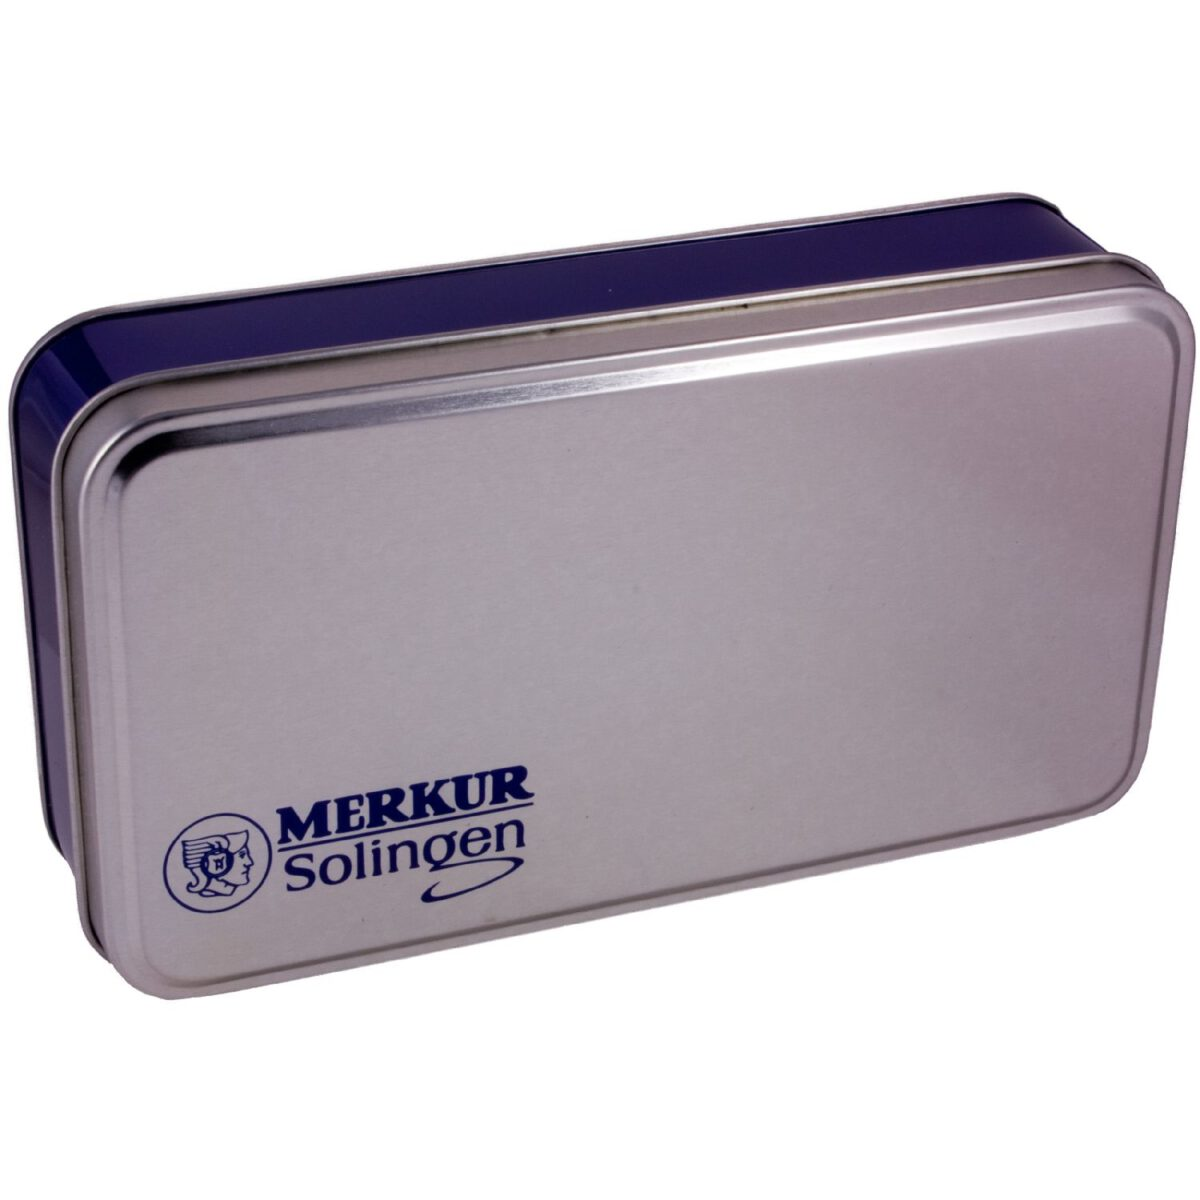 Merkur Futur Adjustable Safety Razor Gift Time & Blades - Gold-450